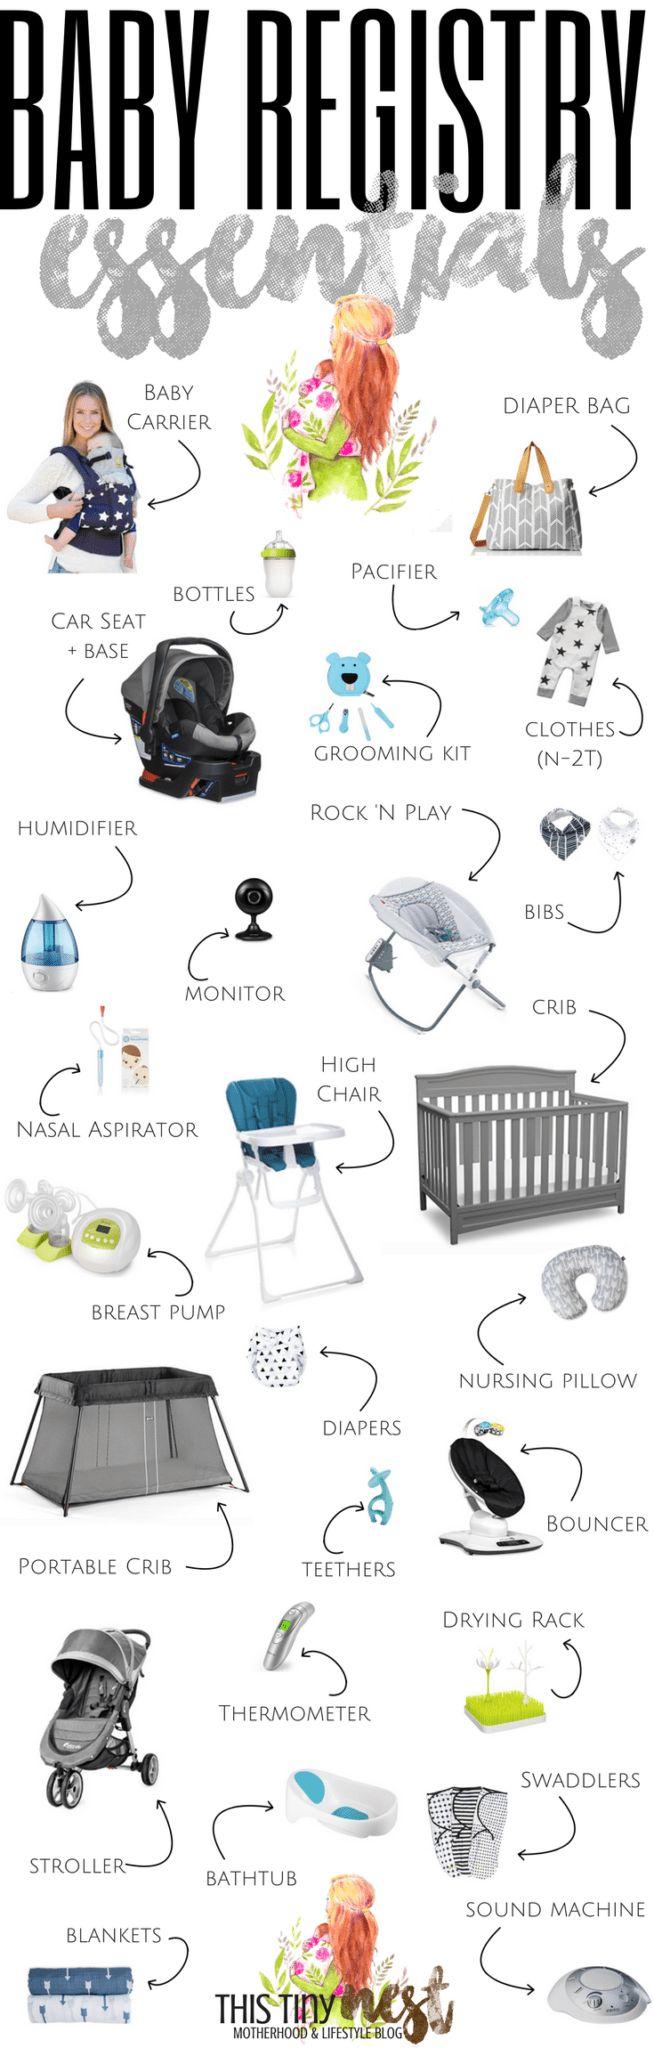 Baby Registry Checklist Pdf 2020